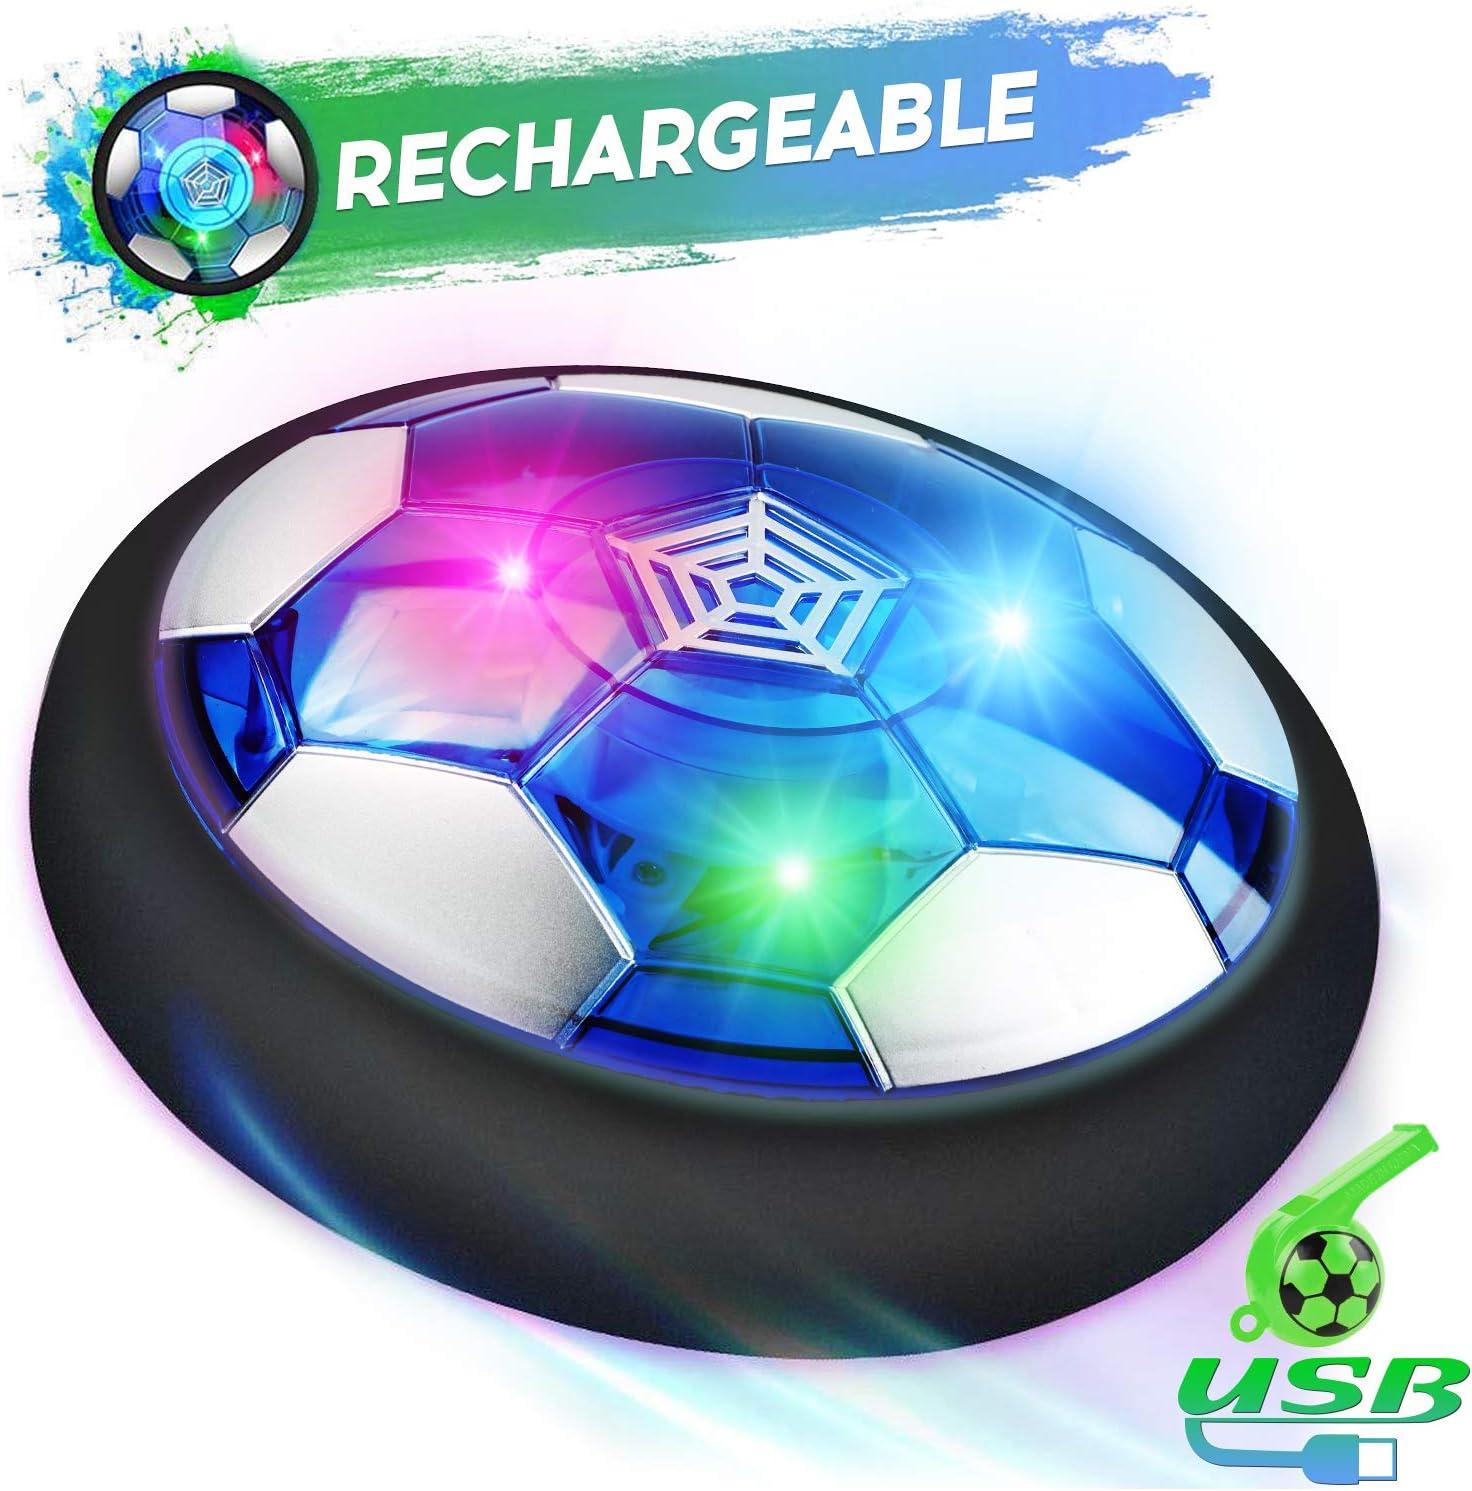 lenbest Air Football, Air Hover Ball Soccer, Juguetes Aire Fútbol con LED, Niños Air Power Soccer Juguetes Divertido para Interiores y Exteriores con Parachoques de Espuma Suave, Luces LED y Silbato